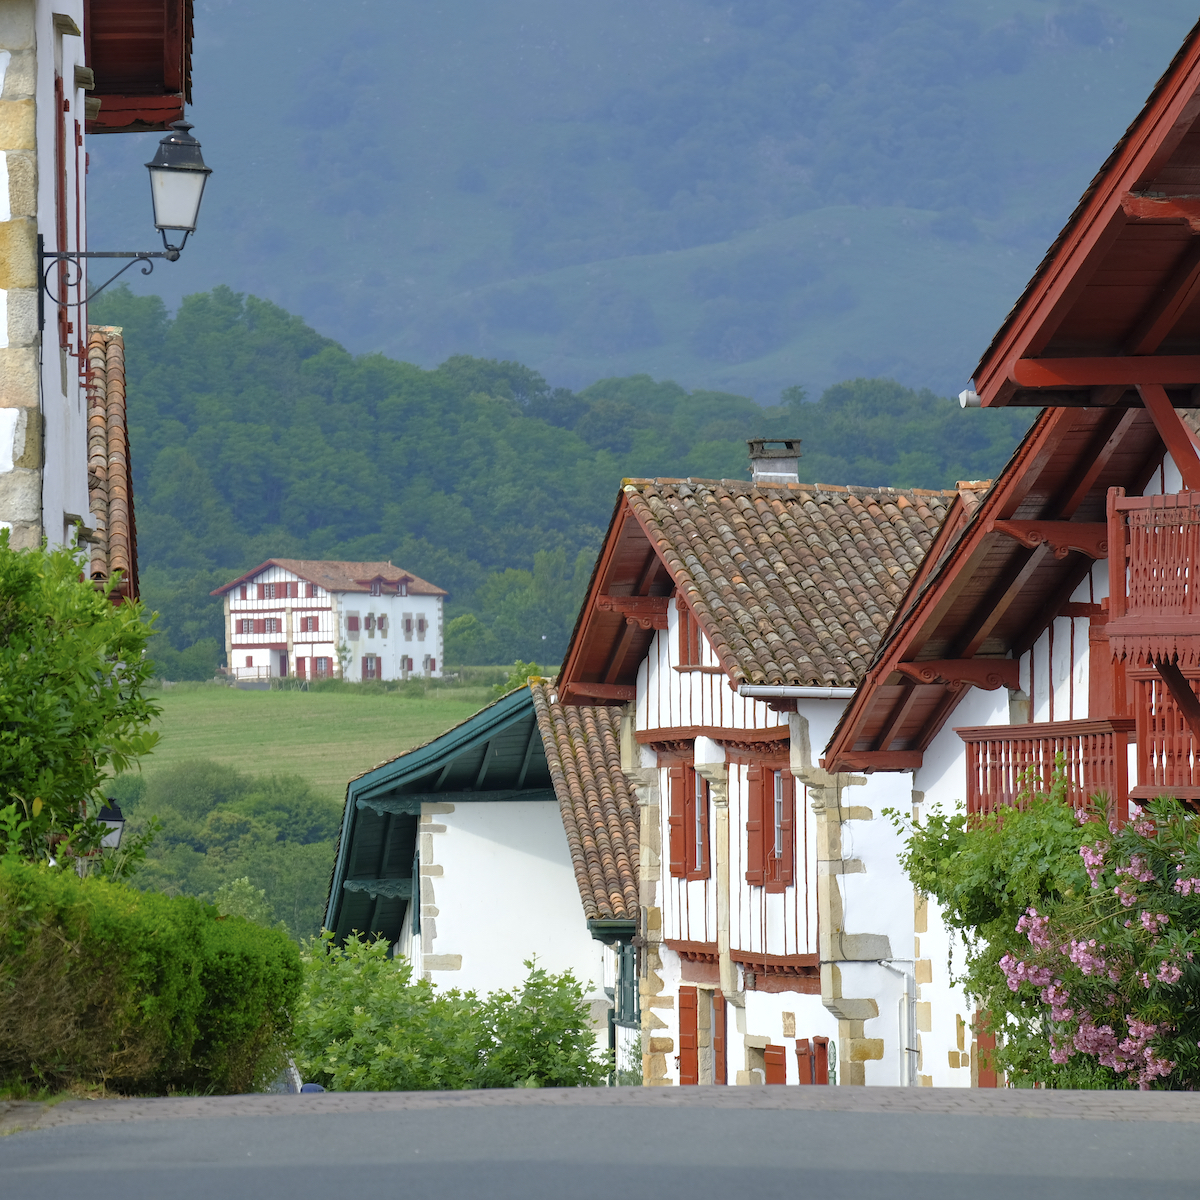 Pays Basque ©Jean-Paul Tonnelier CC BY-NC-ND 2.0